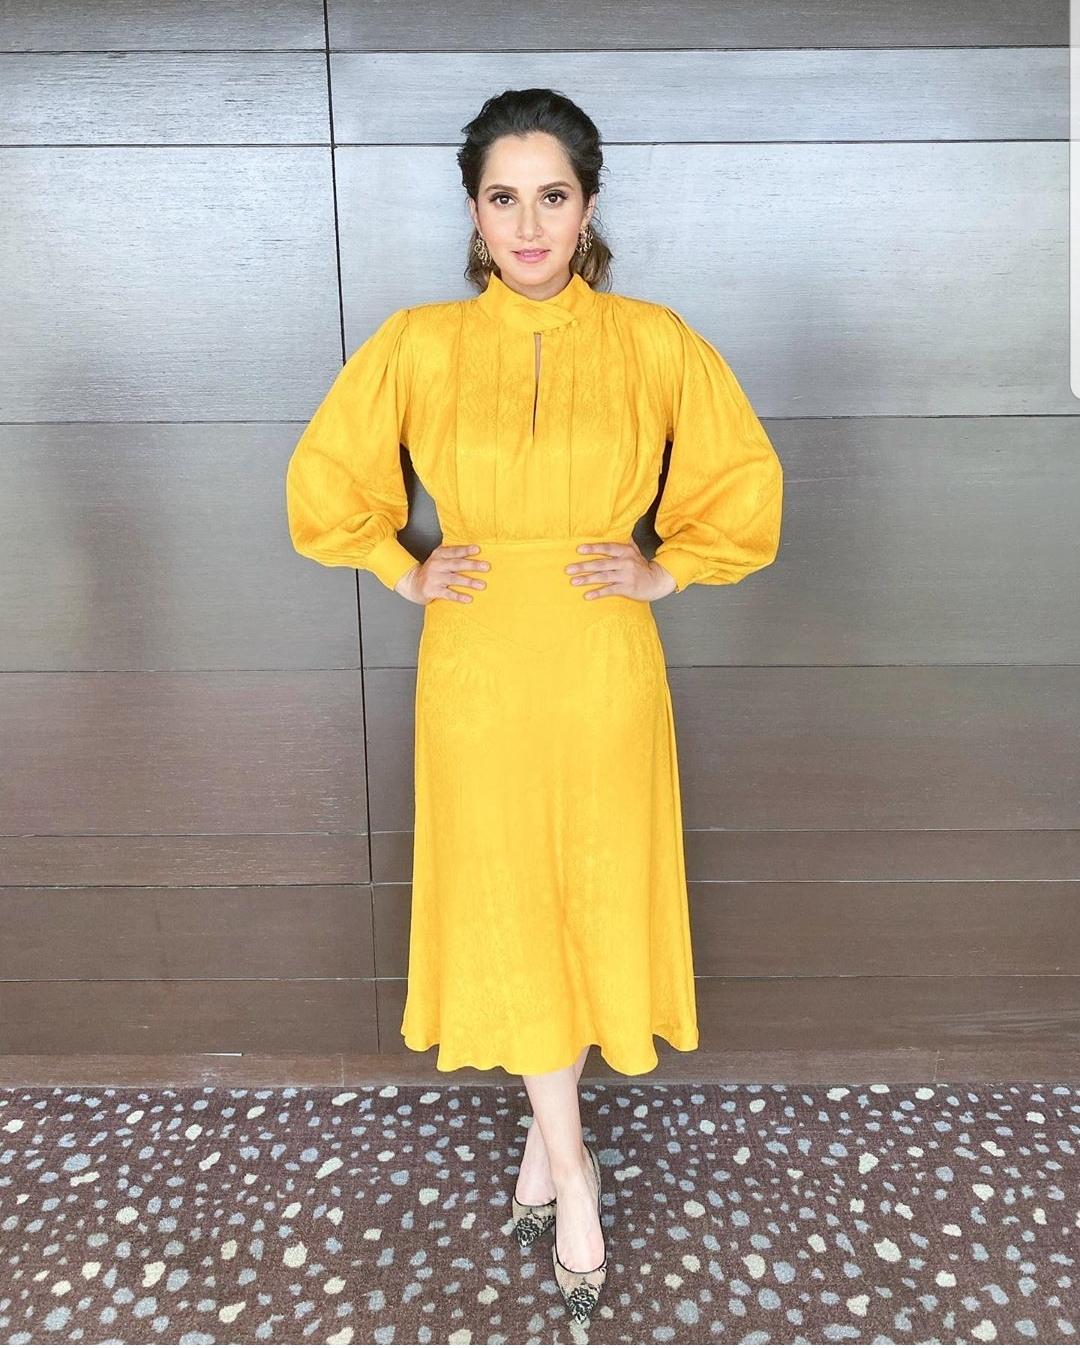 Sania Mirza Shines Like the Sun in a Yellow Ensemble